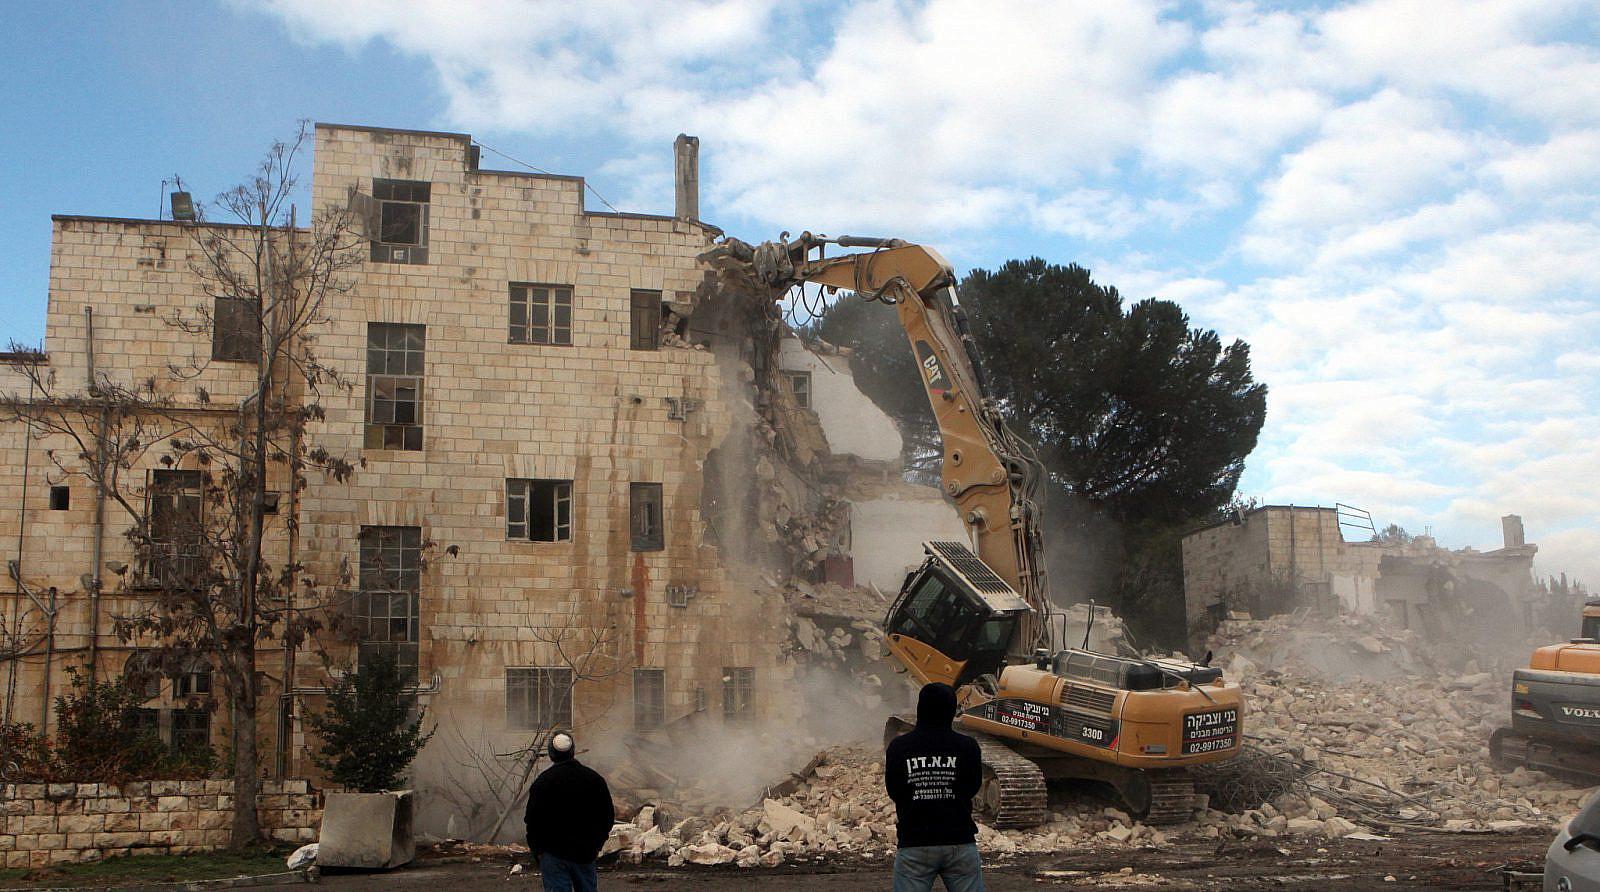 The demolition of the Shepherd Hotel in East Jerusalem's Sheikh Jarrah neighborhood, January 9, 2011. (Yossi Zamir/Flash90)